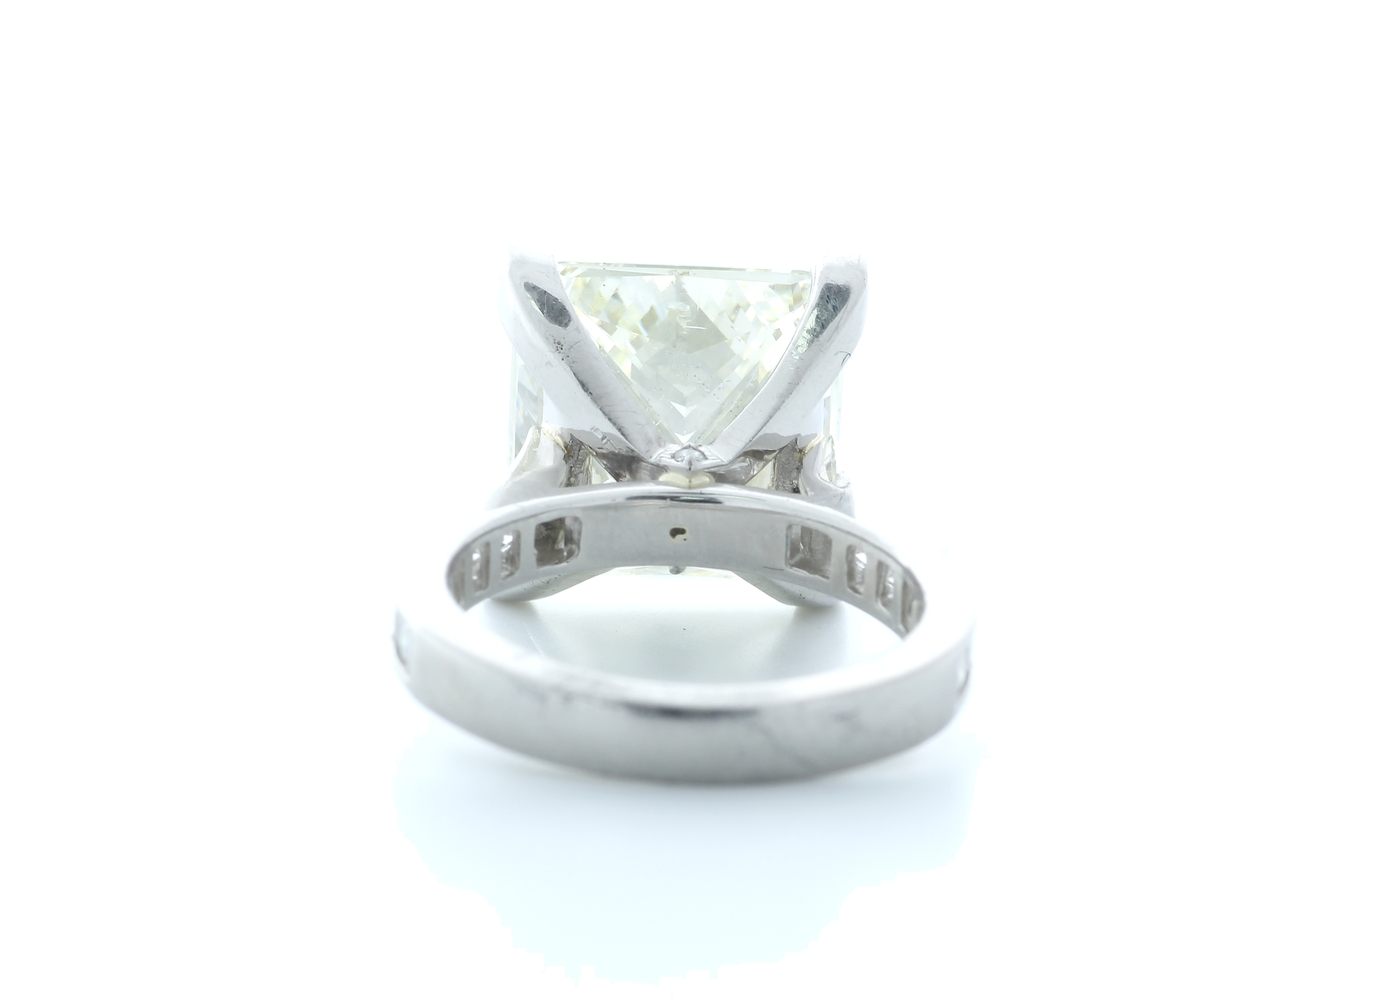 18ct White Gold Princess Cut Diamond Ring 10.00 Carats - Image 3 of 5